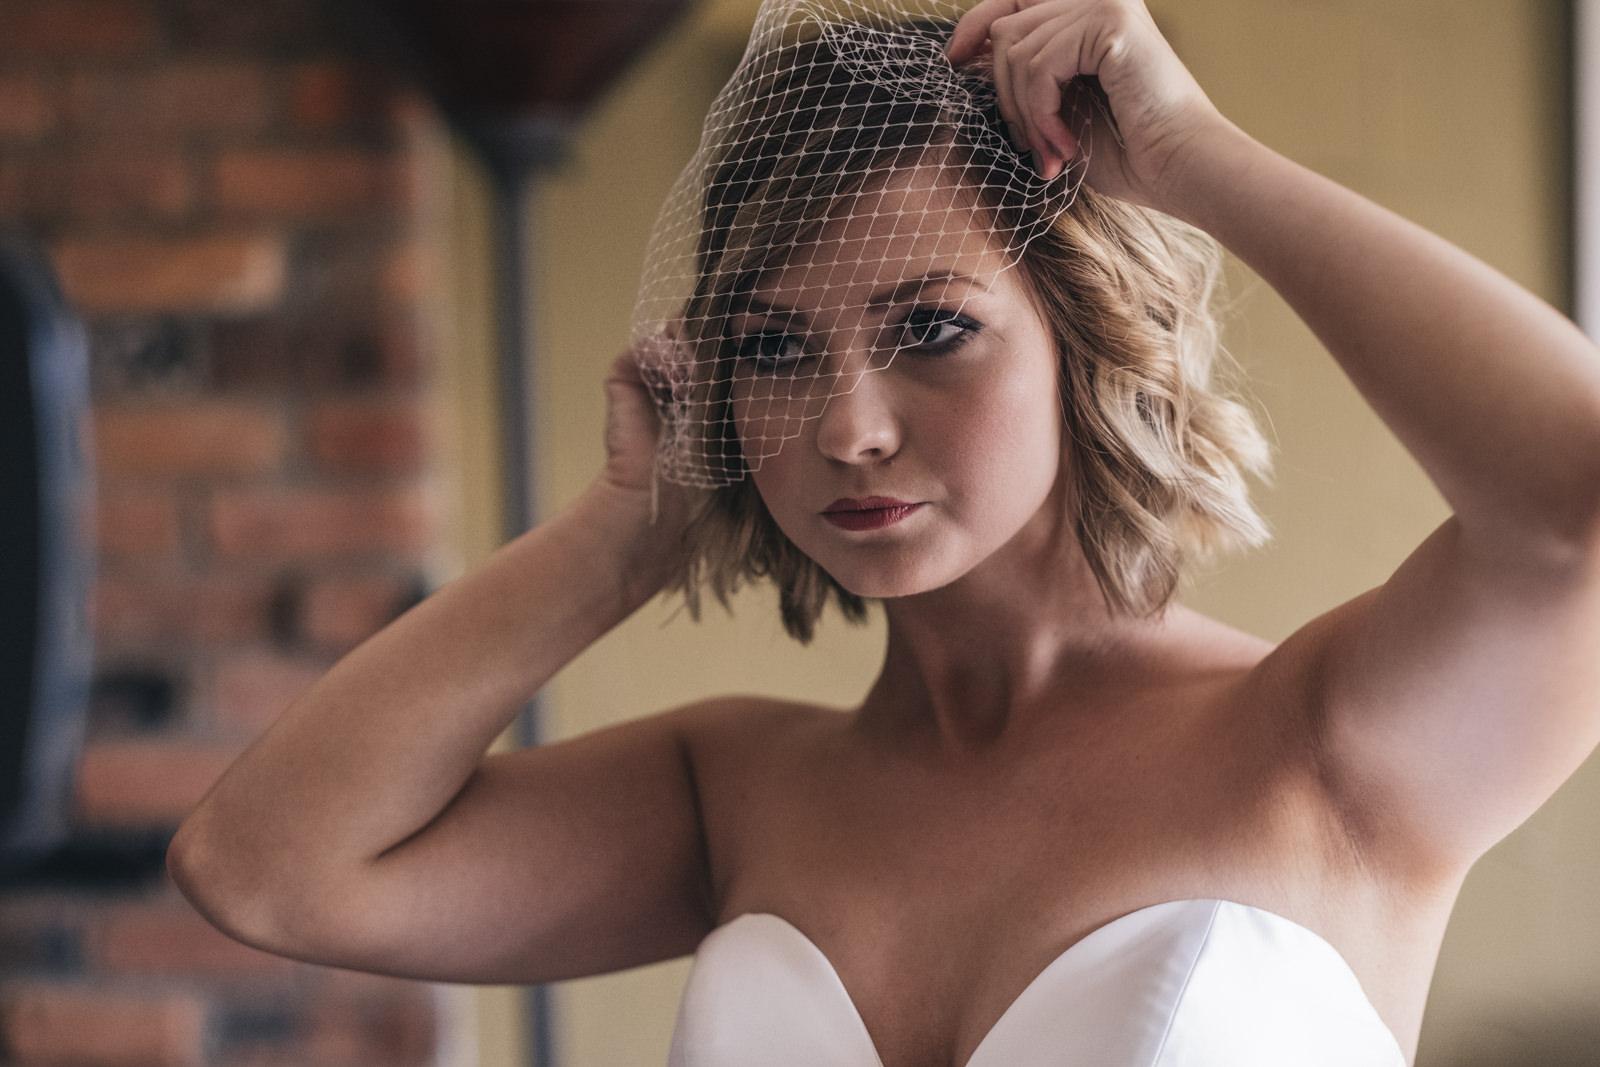 Bride putting on birdcage veil on wedding day.